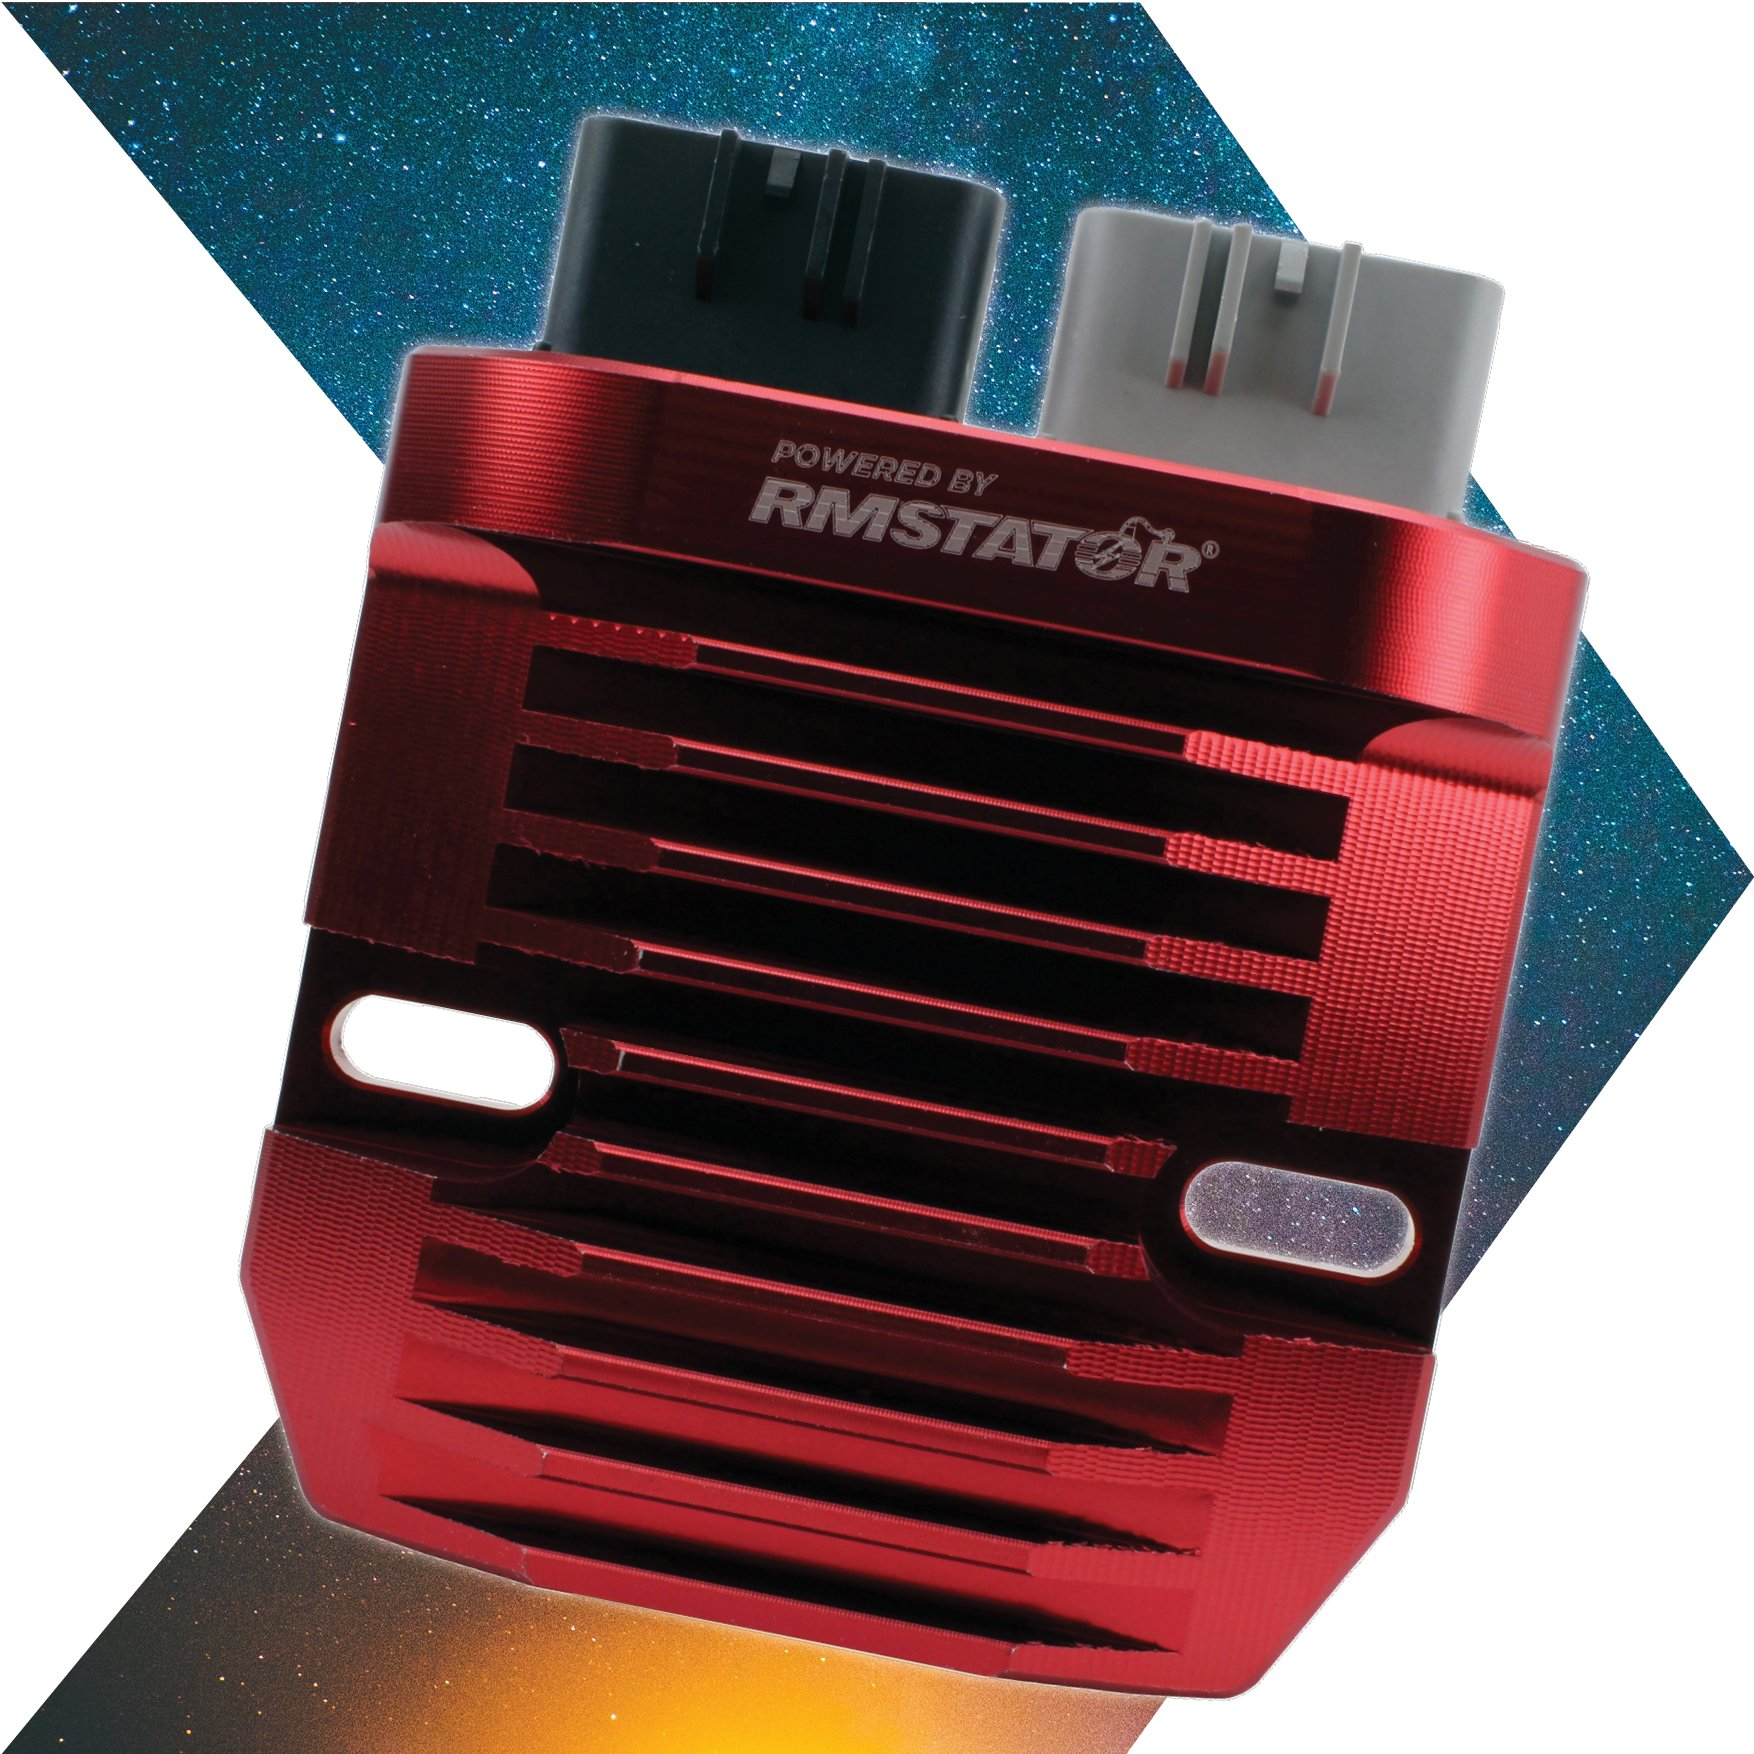 MOSFET REGULATOR RECTIFIER FITS KAWASAKI KRT750 TERYX-4 750 4X4 EPS LE 2012 2013